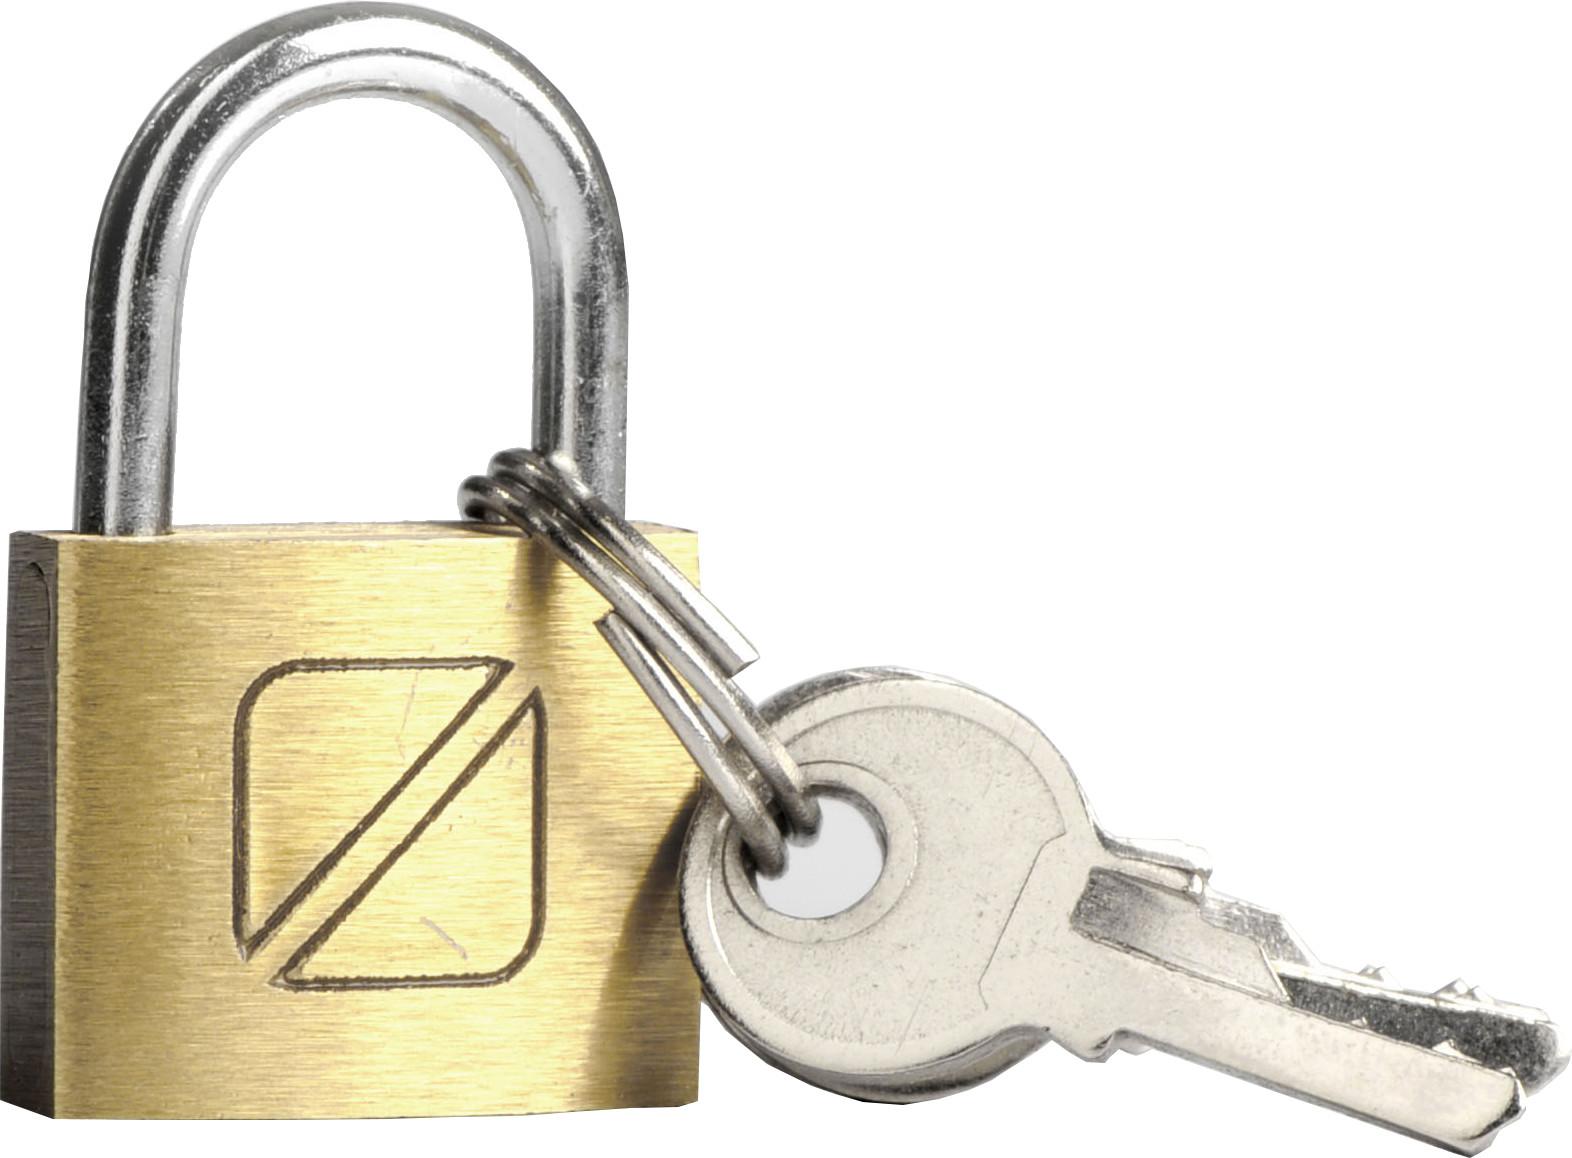 Hotel Safe Lock Straps Related Keywords & Suggestions - Hotel Safe